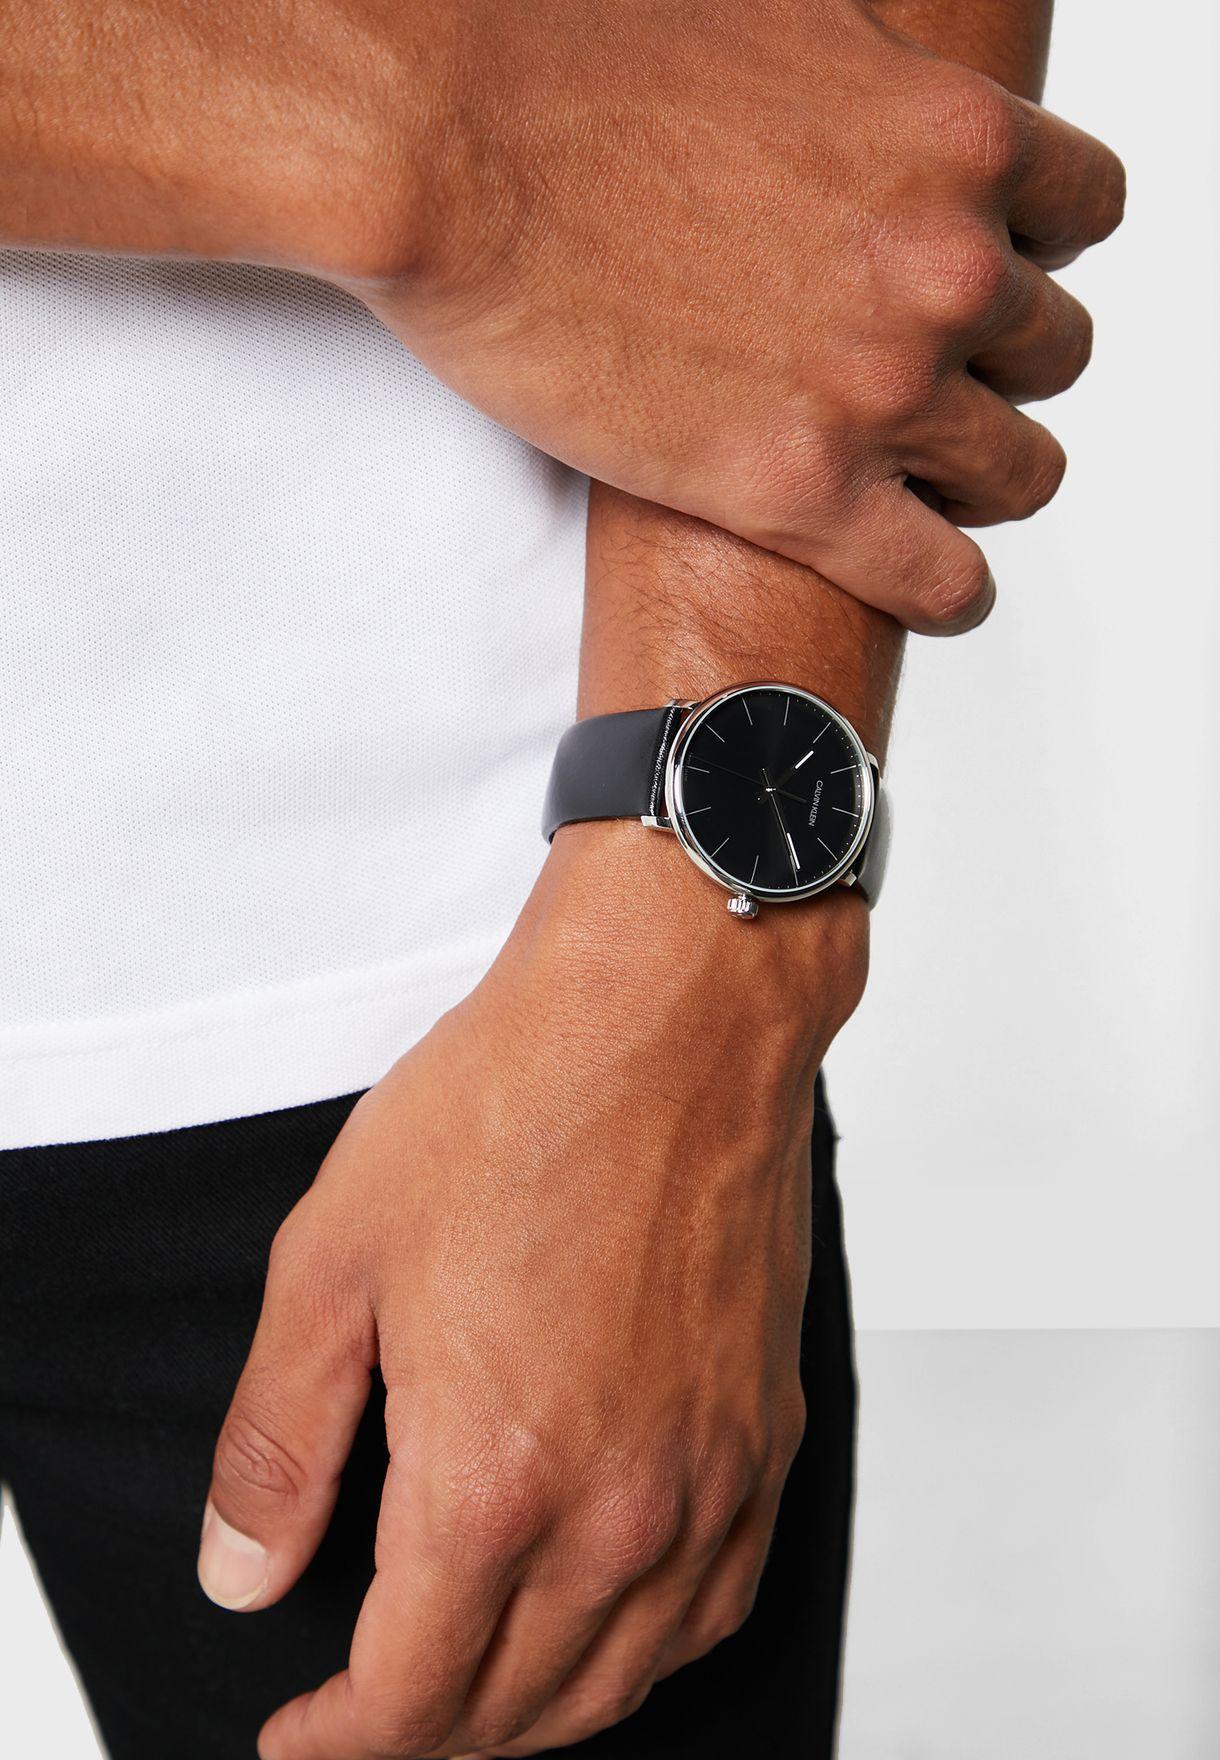 K8M211-C1 Analog Watch